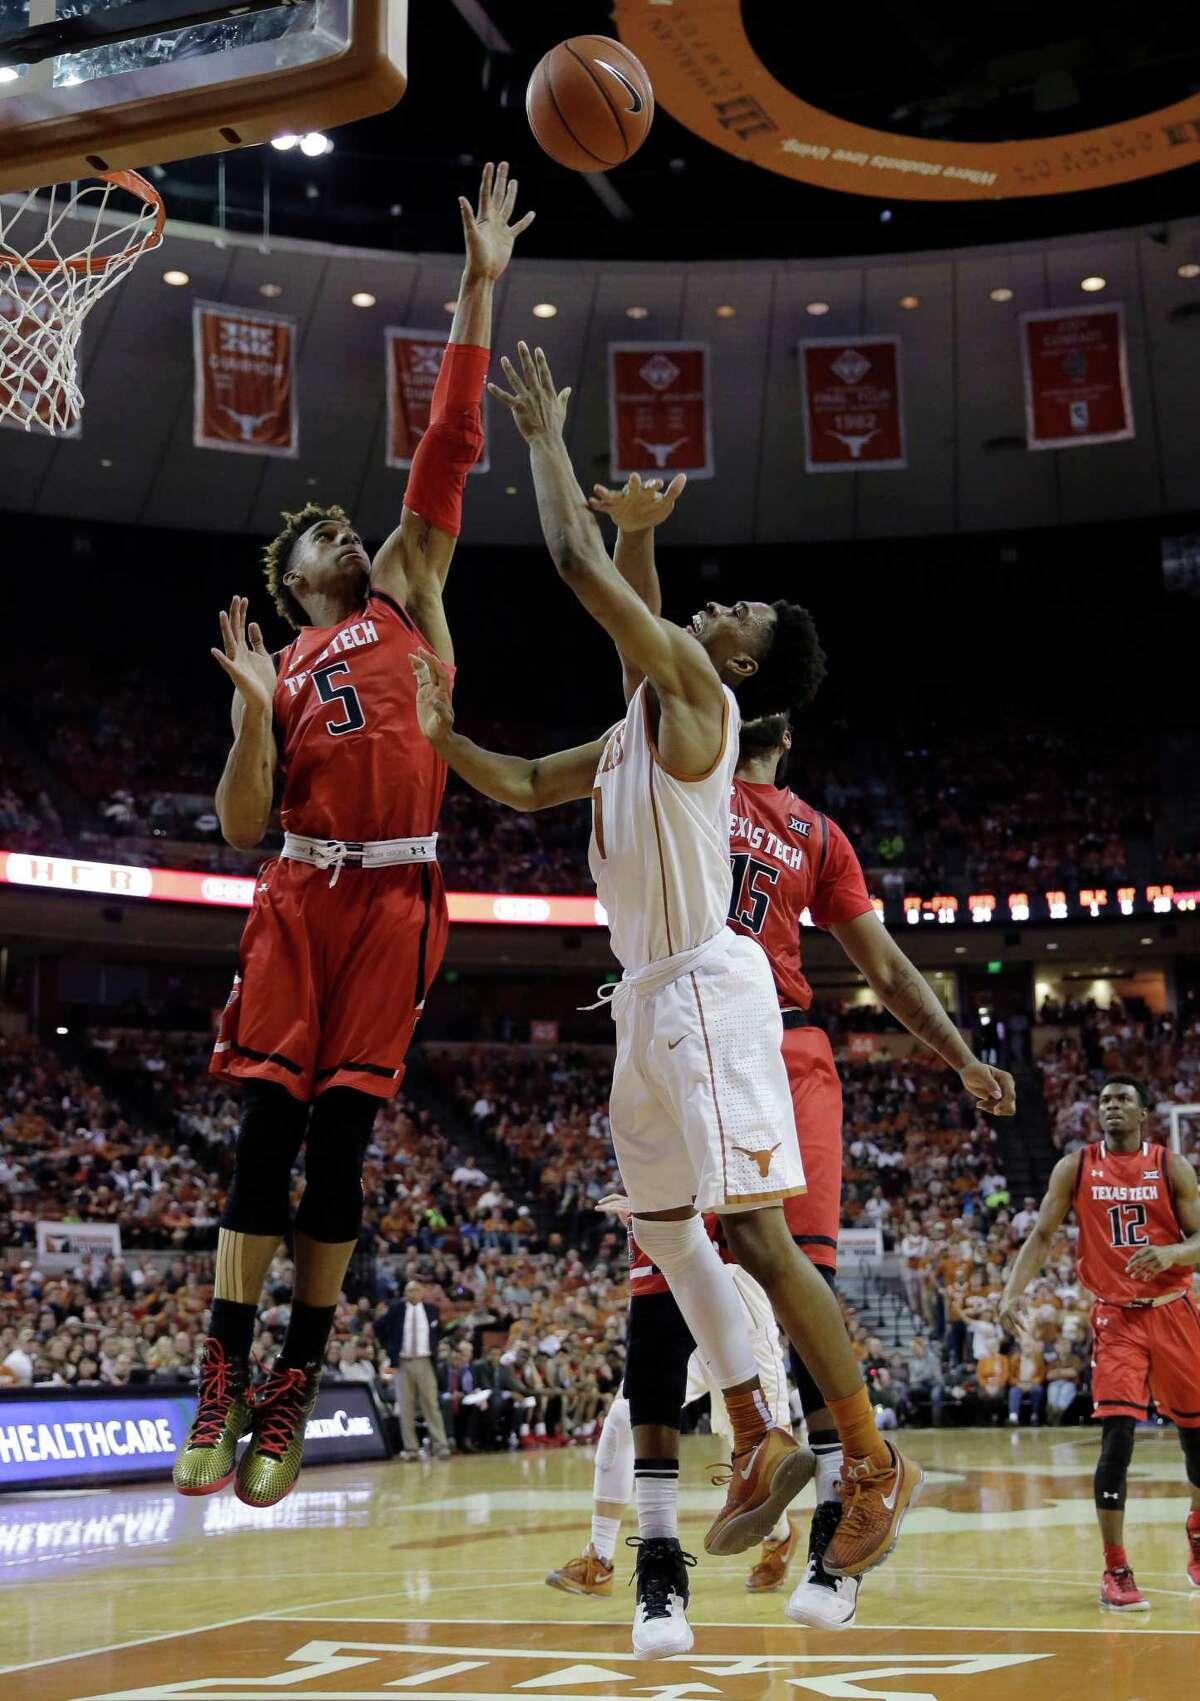 Texas guard Isaiah Taylor (1) shoots over Texas Tech forward Justin Gray (5) during the second half of an NCAA college basketball game, Saturday, Feb. 6, 2016, in Austin, Texas. Texas won 69-59. (AP Photo/Eric Gay)